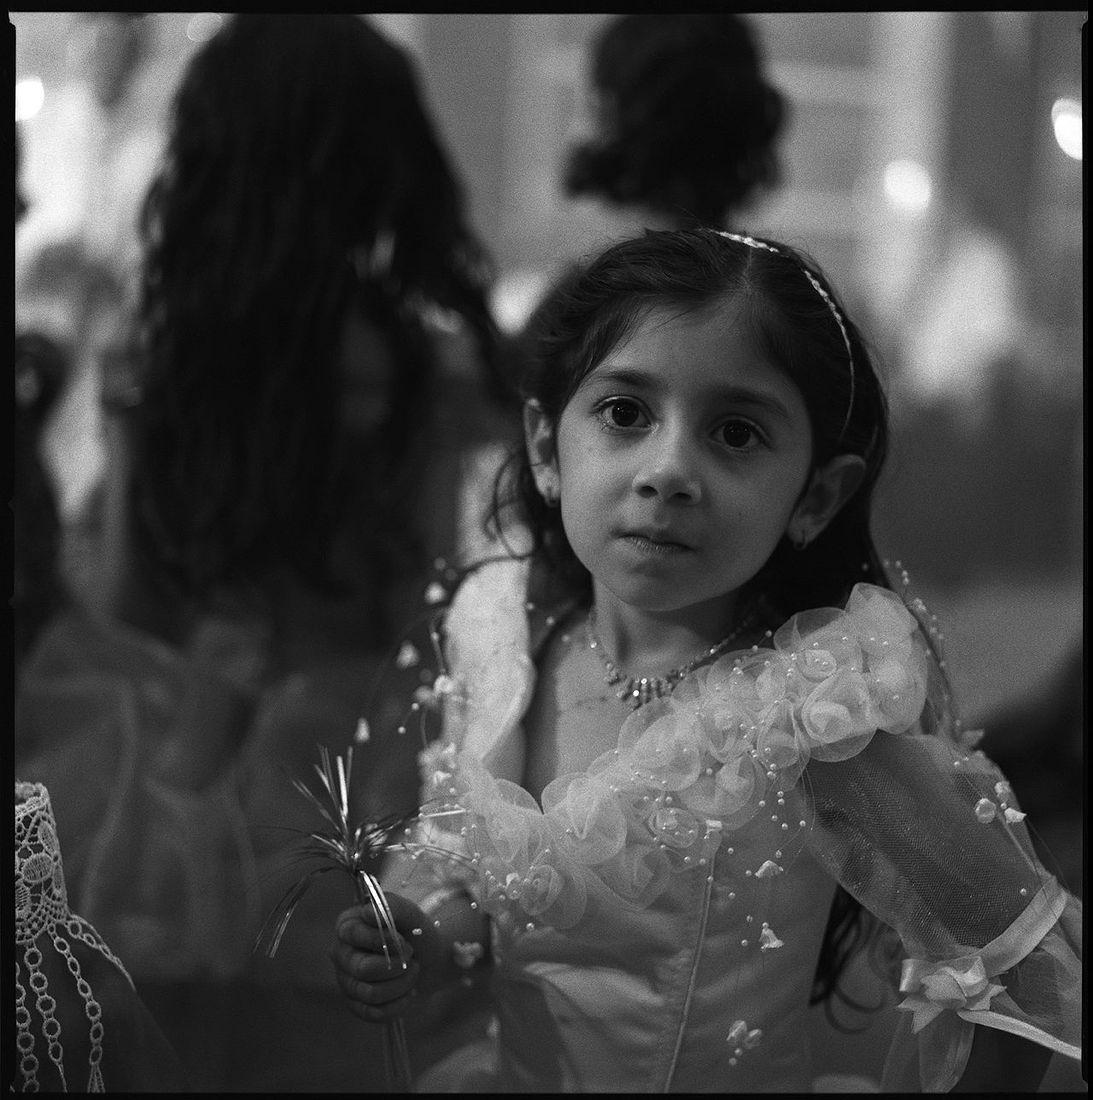 alpauk. Gypsies, wedding. 2007. sent05-04